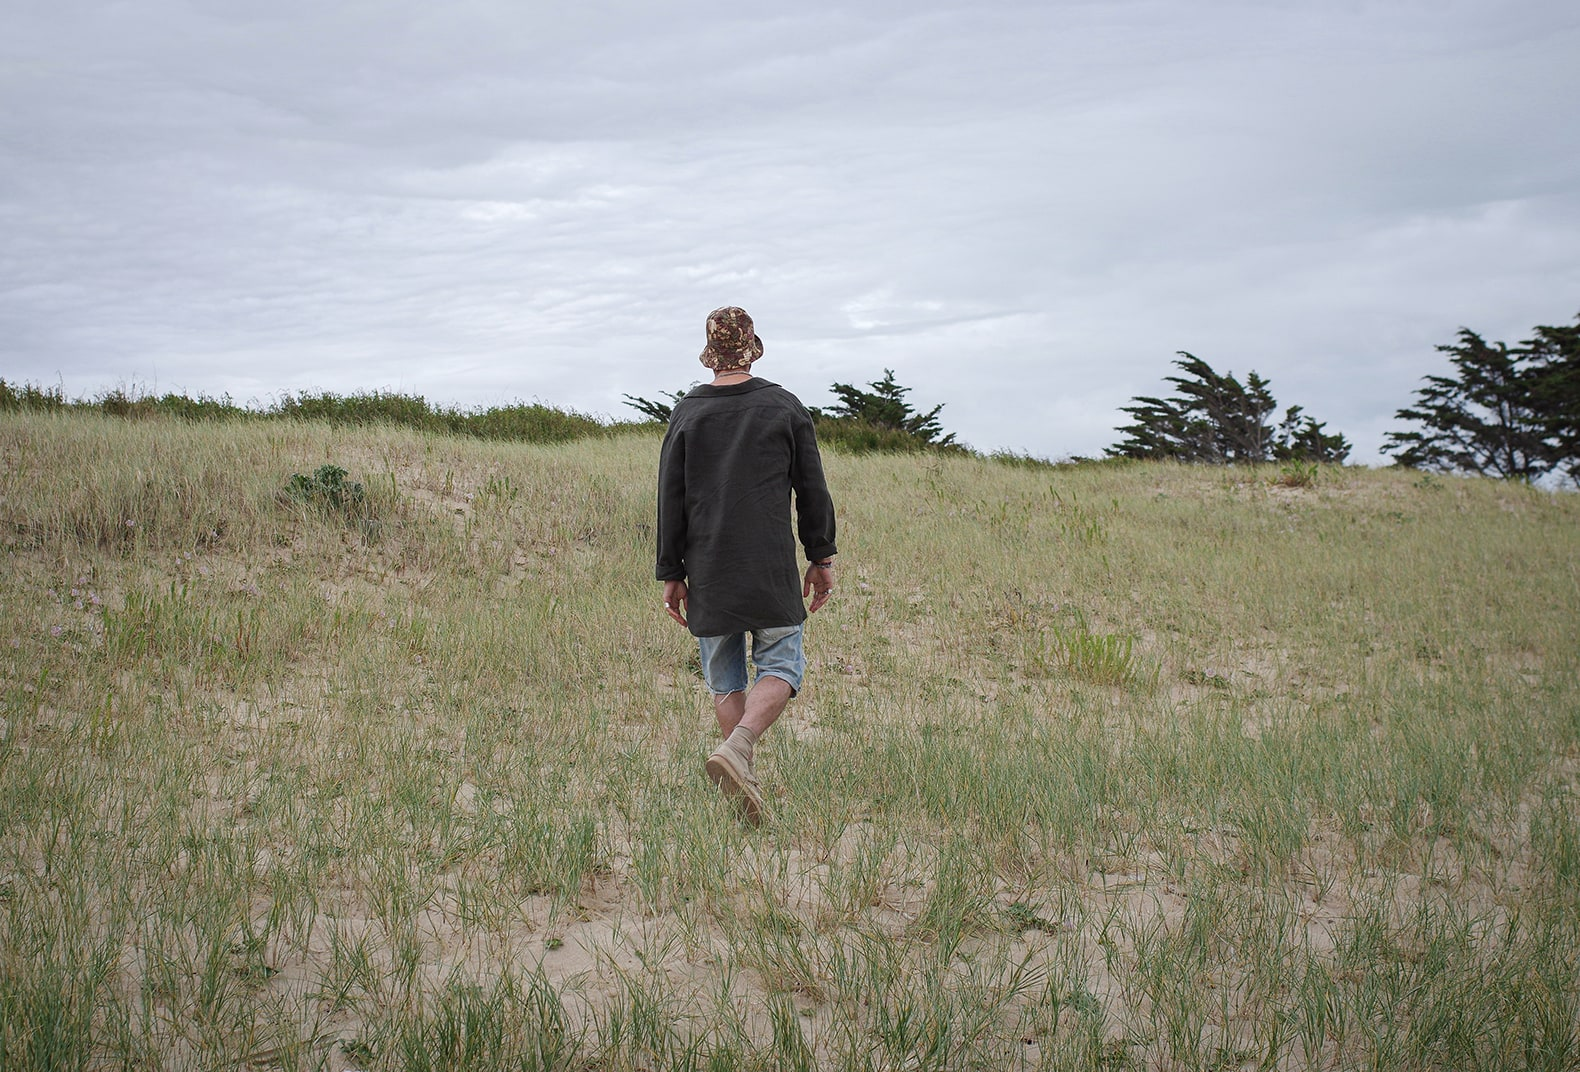 dune de sable et shooting mode borasification